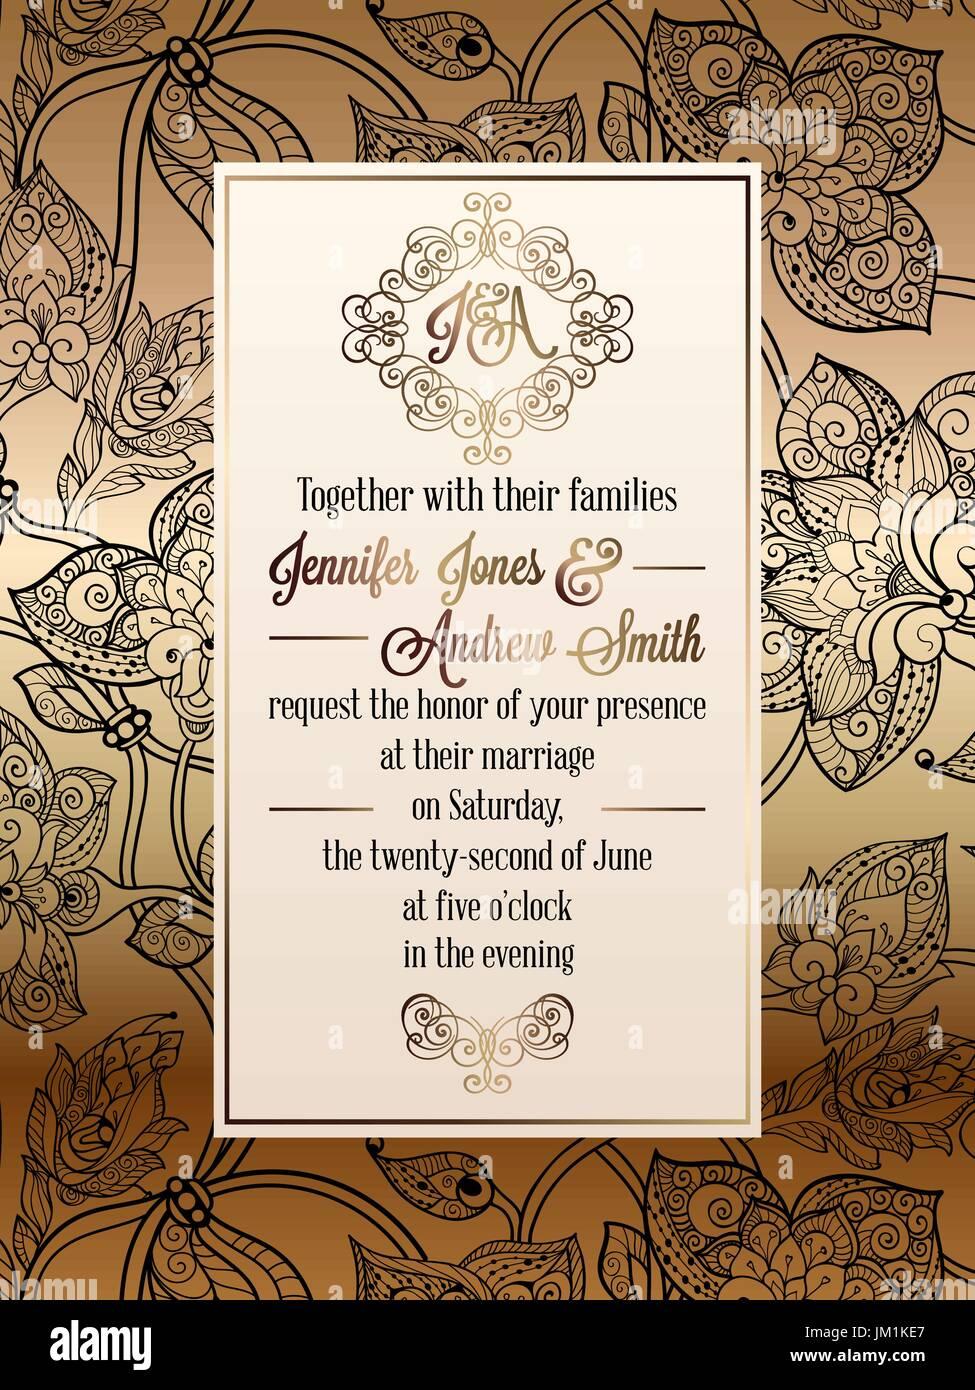 Vintage baroque style wedding invitation card template elegant vintage baroque style wedding invitation card template elegant formal design with damask background traditional decoration for wedding gold and b stopboris Choice Image